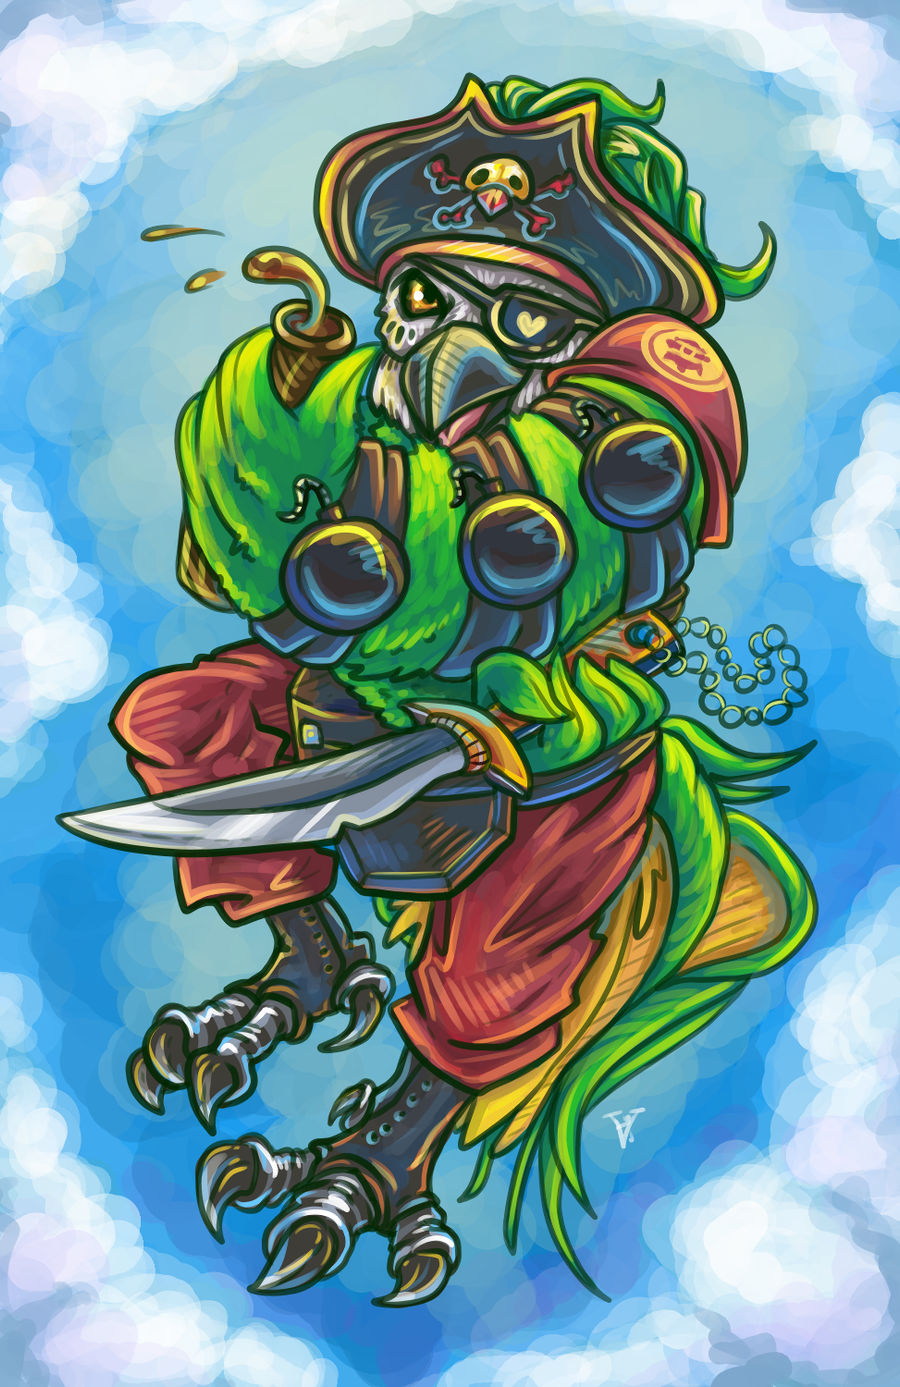 demoman pirate parrot by chuchucolate on deviantart